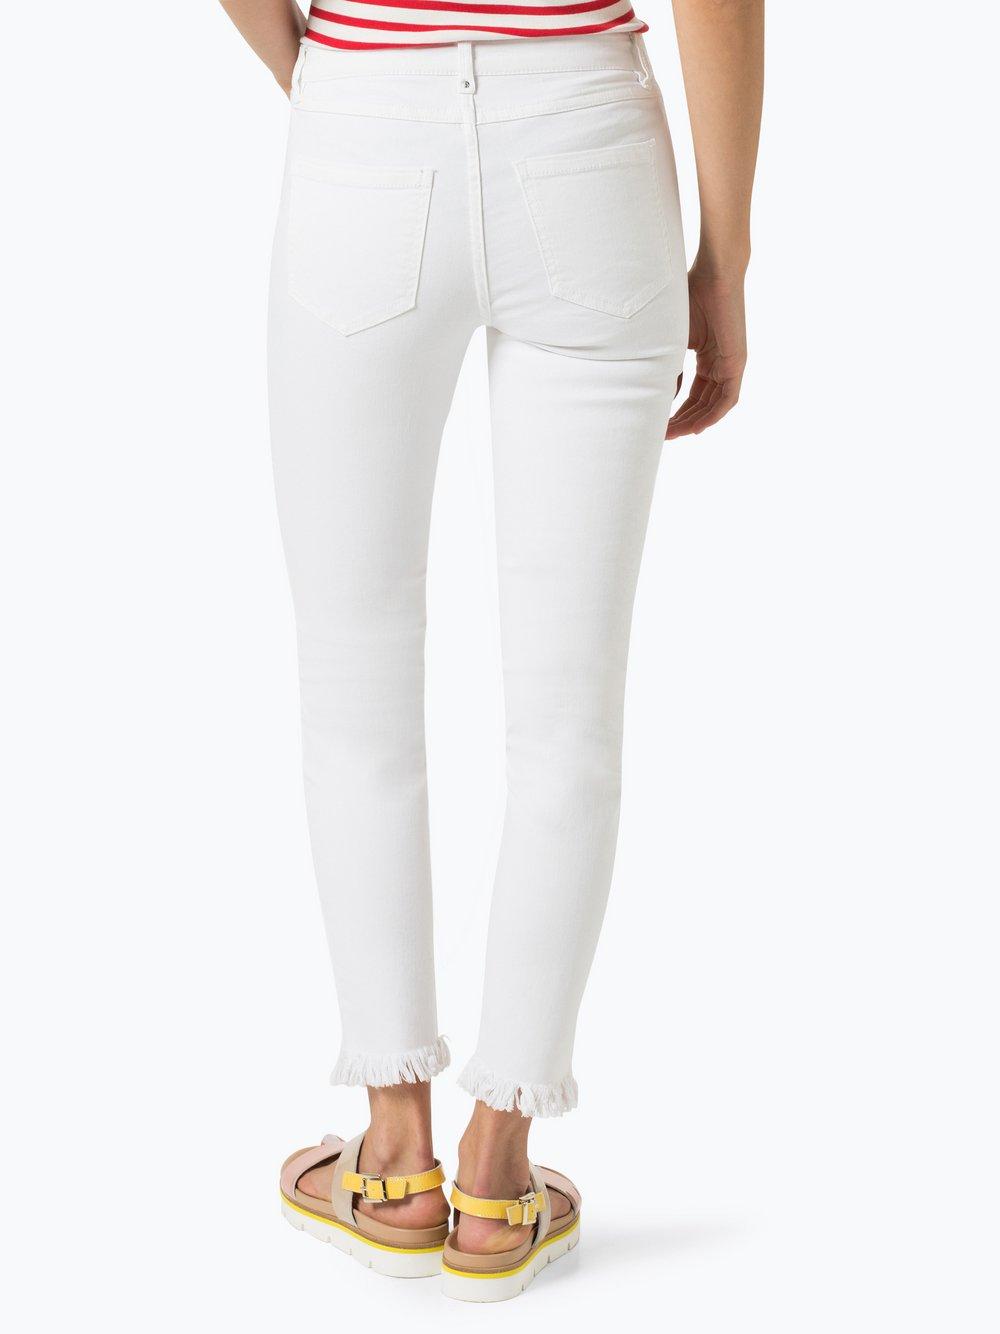 Damen Jeans - Vijunas schwarz Vila xVebwrfrSC